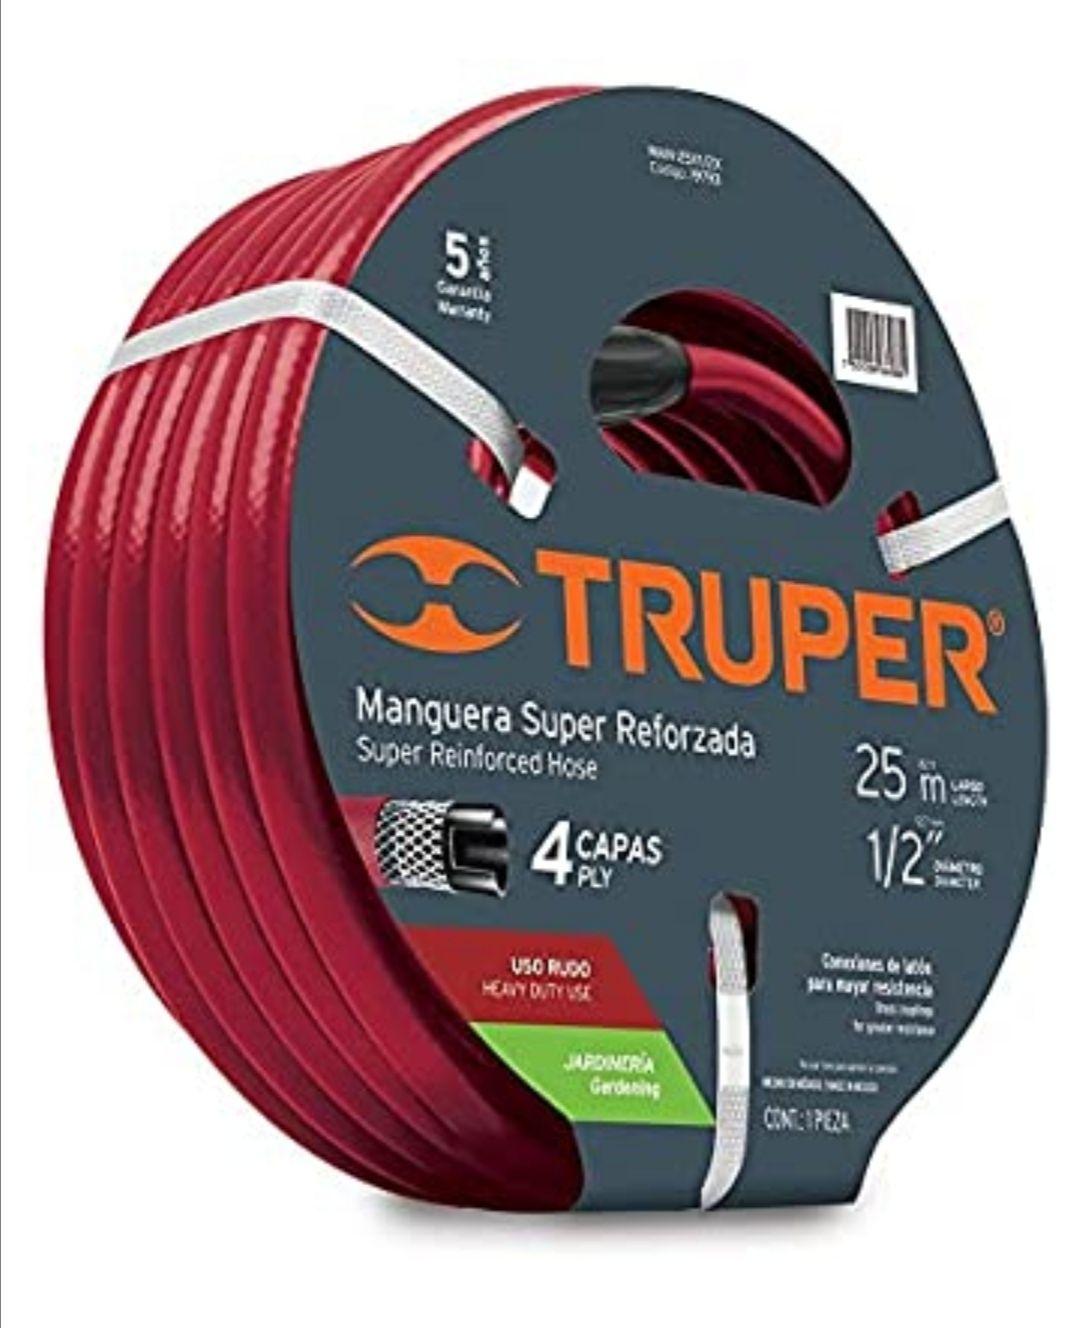 "Amazon: Truper MAN-25X1/2X, Manguera armada super reforzadas 4 capas, conexiones metálicas, 1/2"", 25 m"